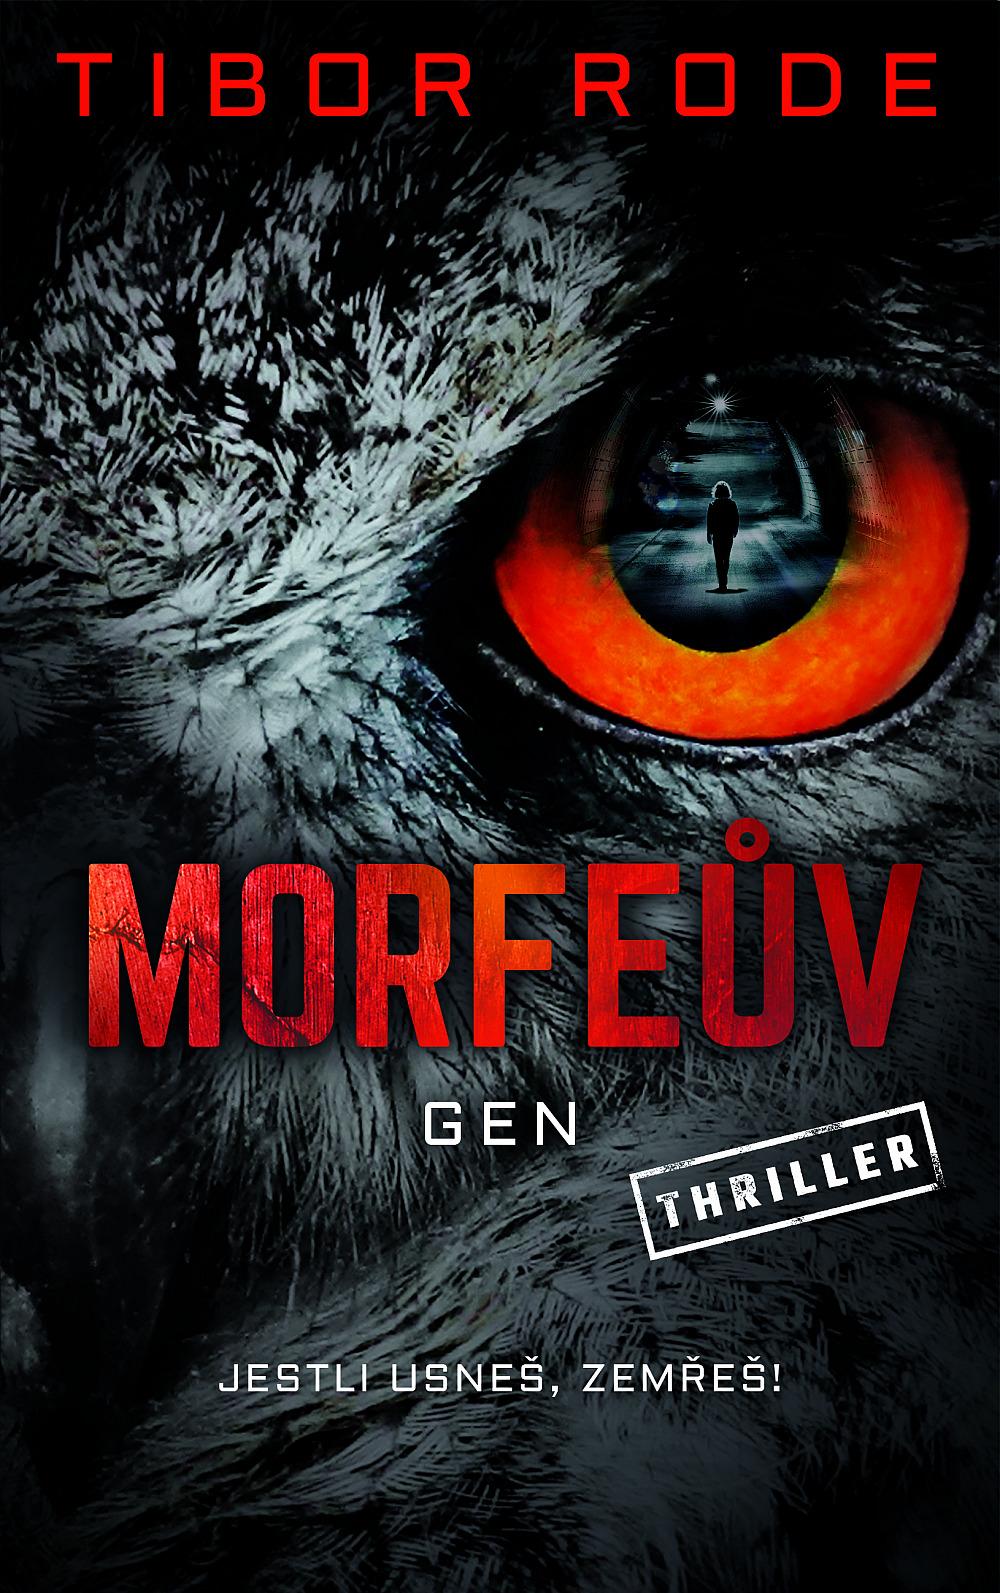 big_morfeuv-gen-sRh-415290